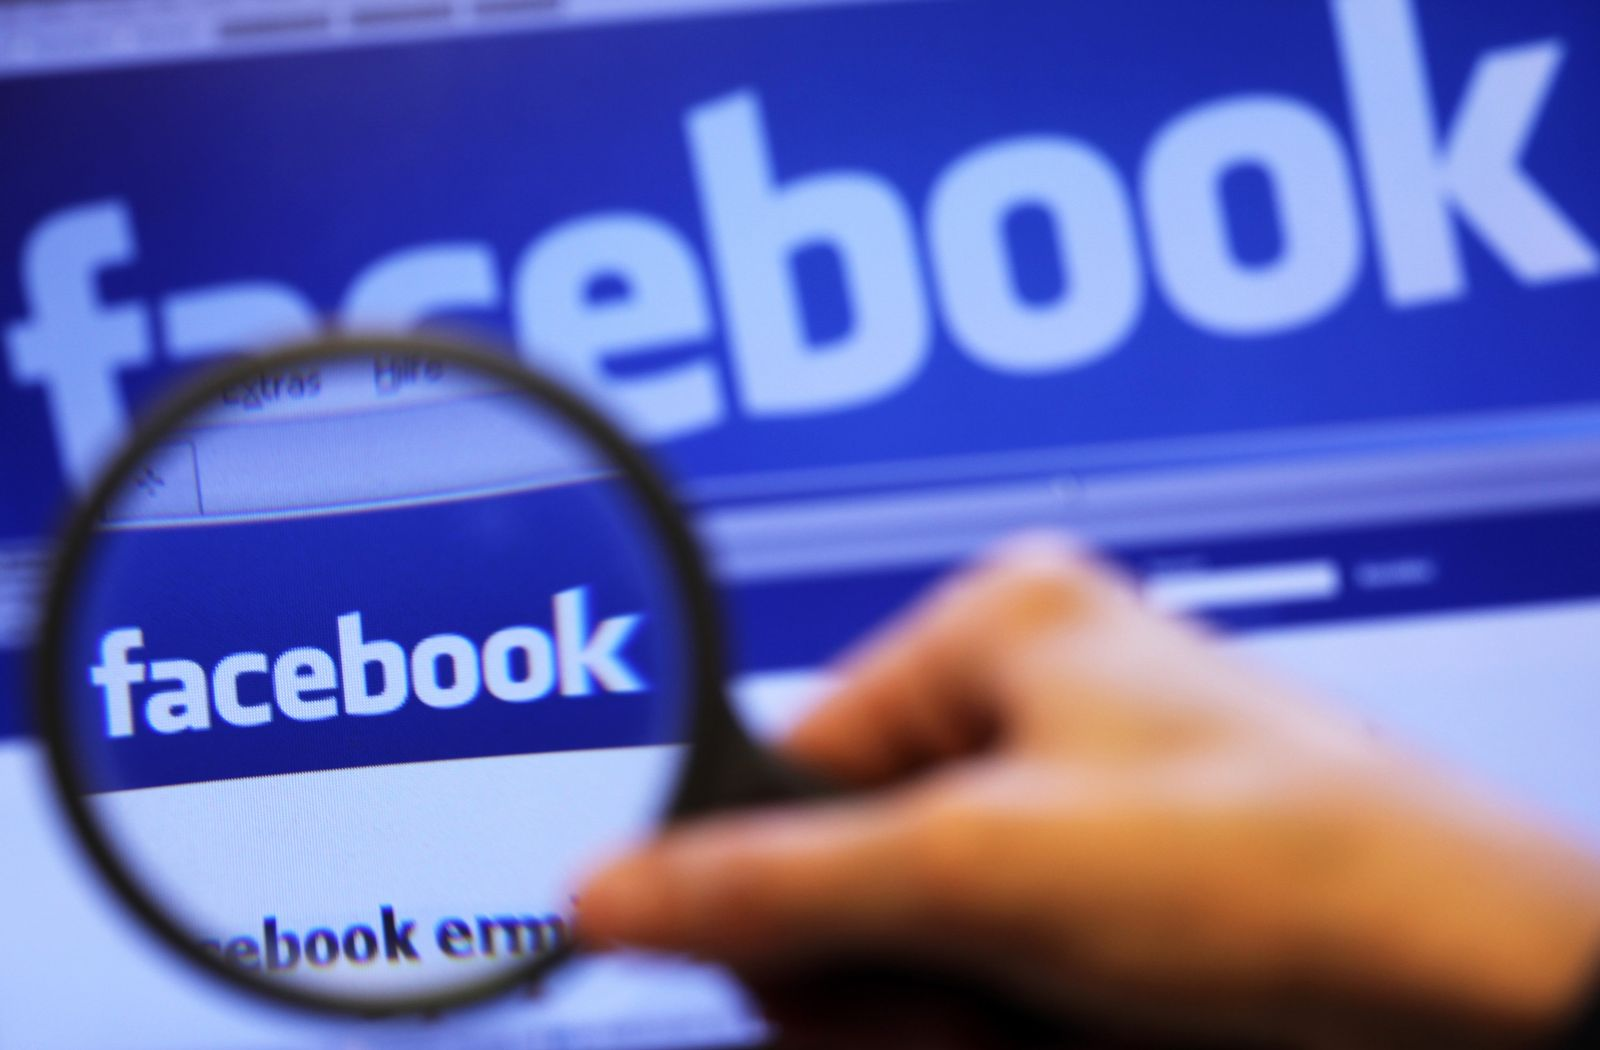 Verbraucherzentrale / Facebook / Klage